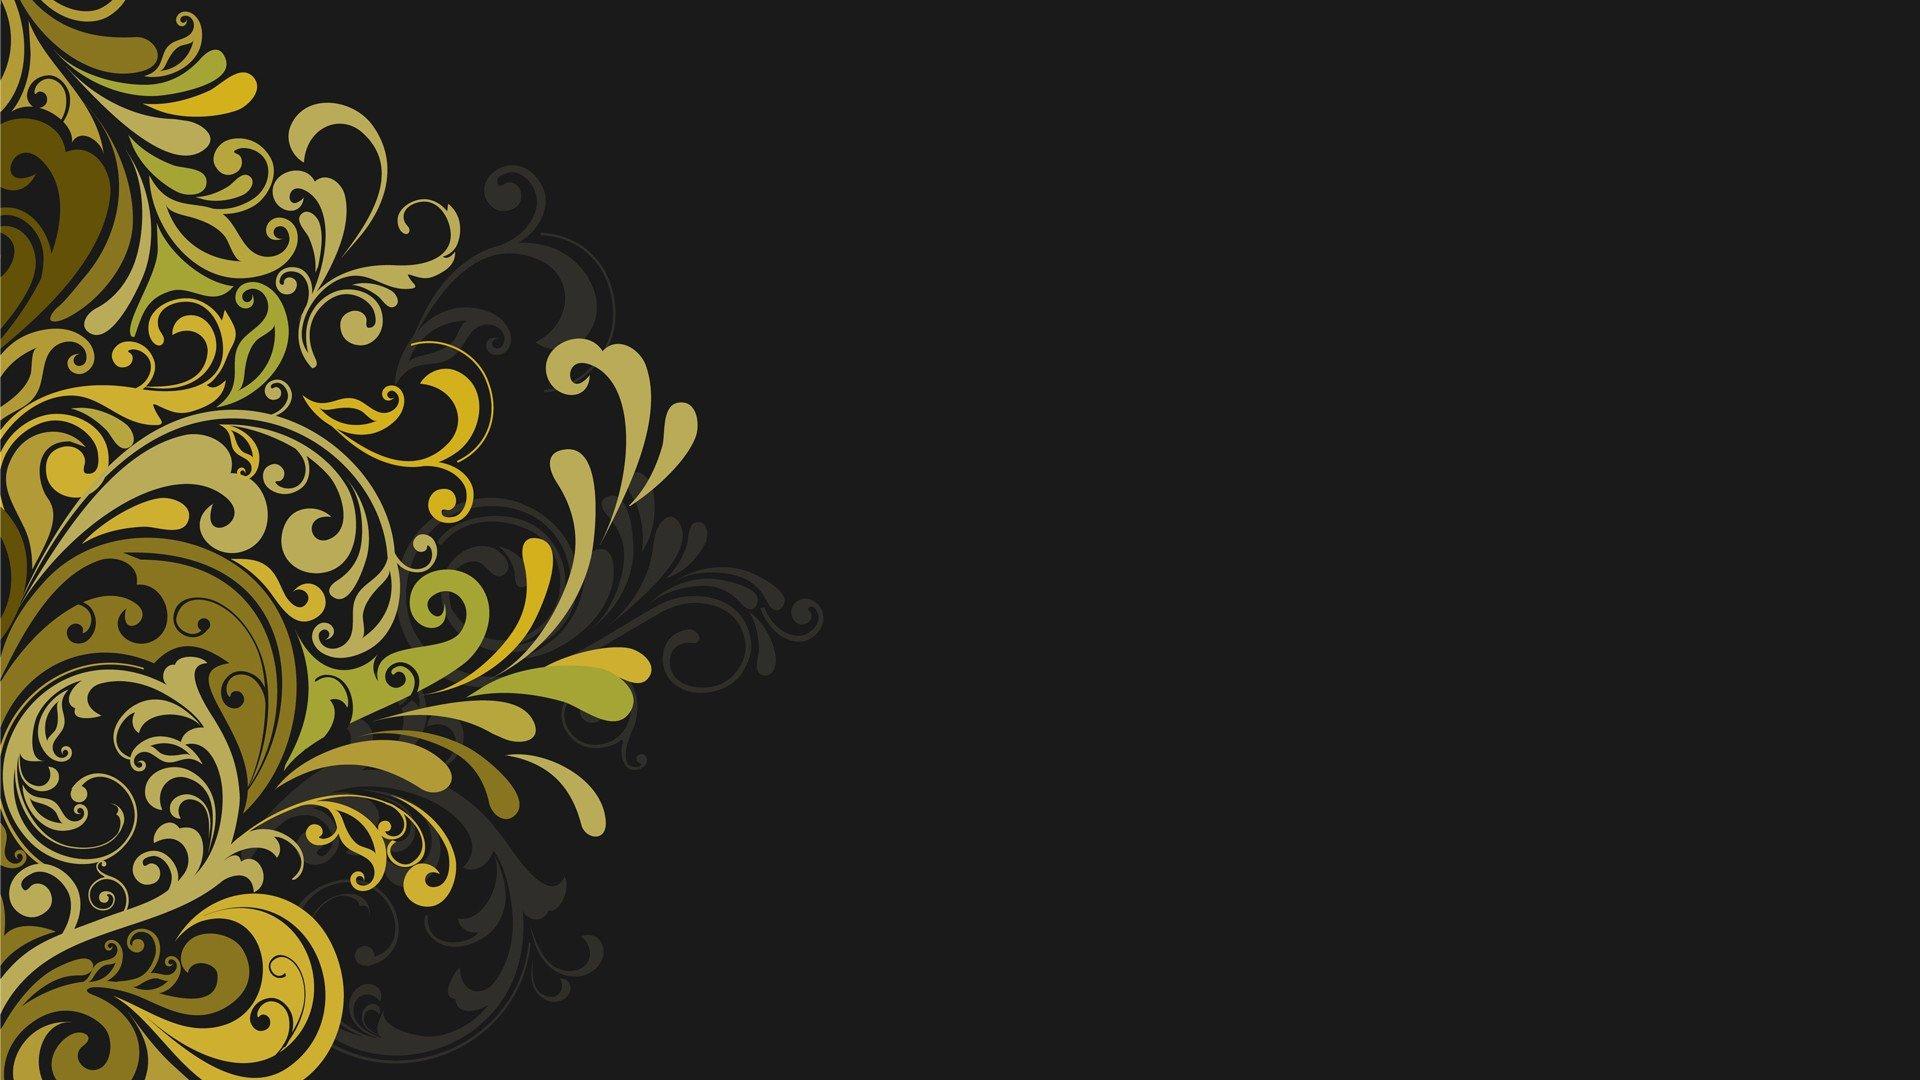 Vectors Floral Graphics Grey Background Wallpaper 1920x1080 320887 Wallpaperup